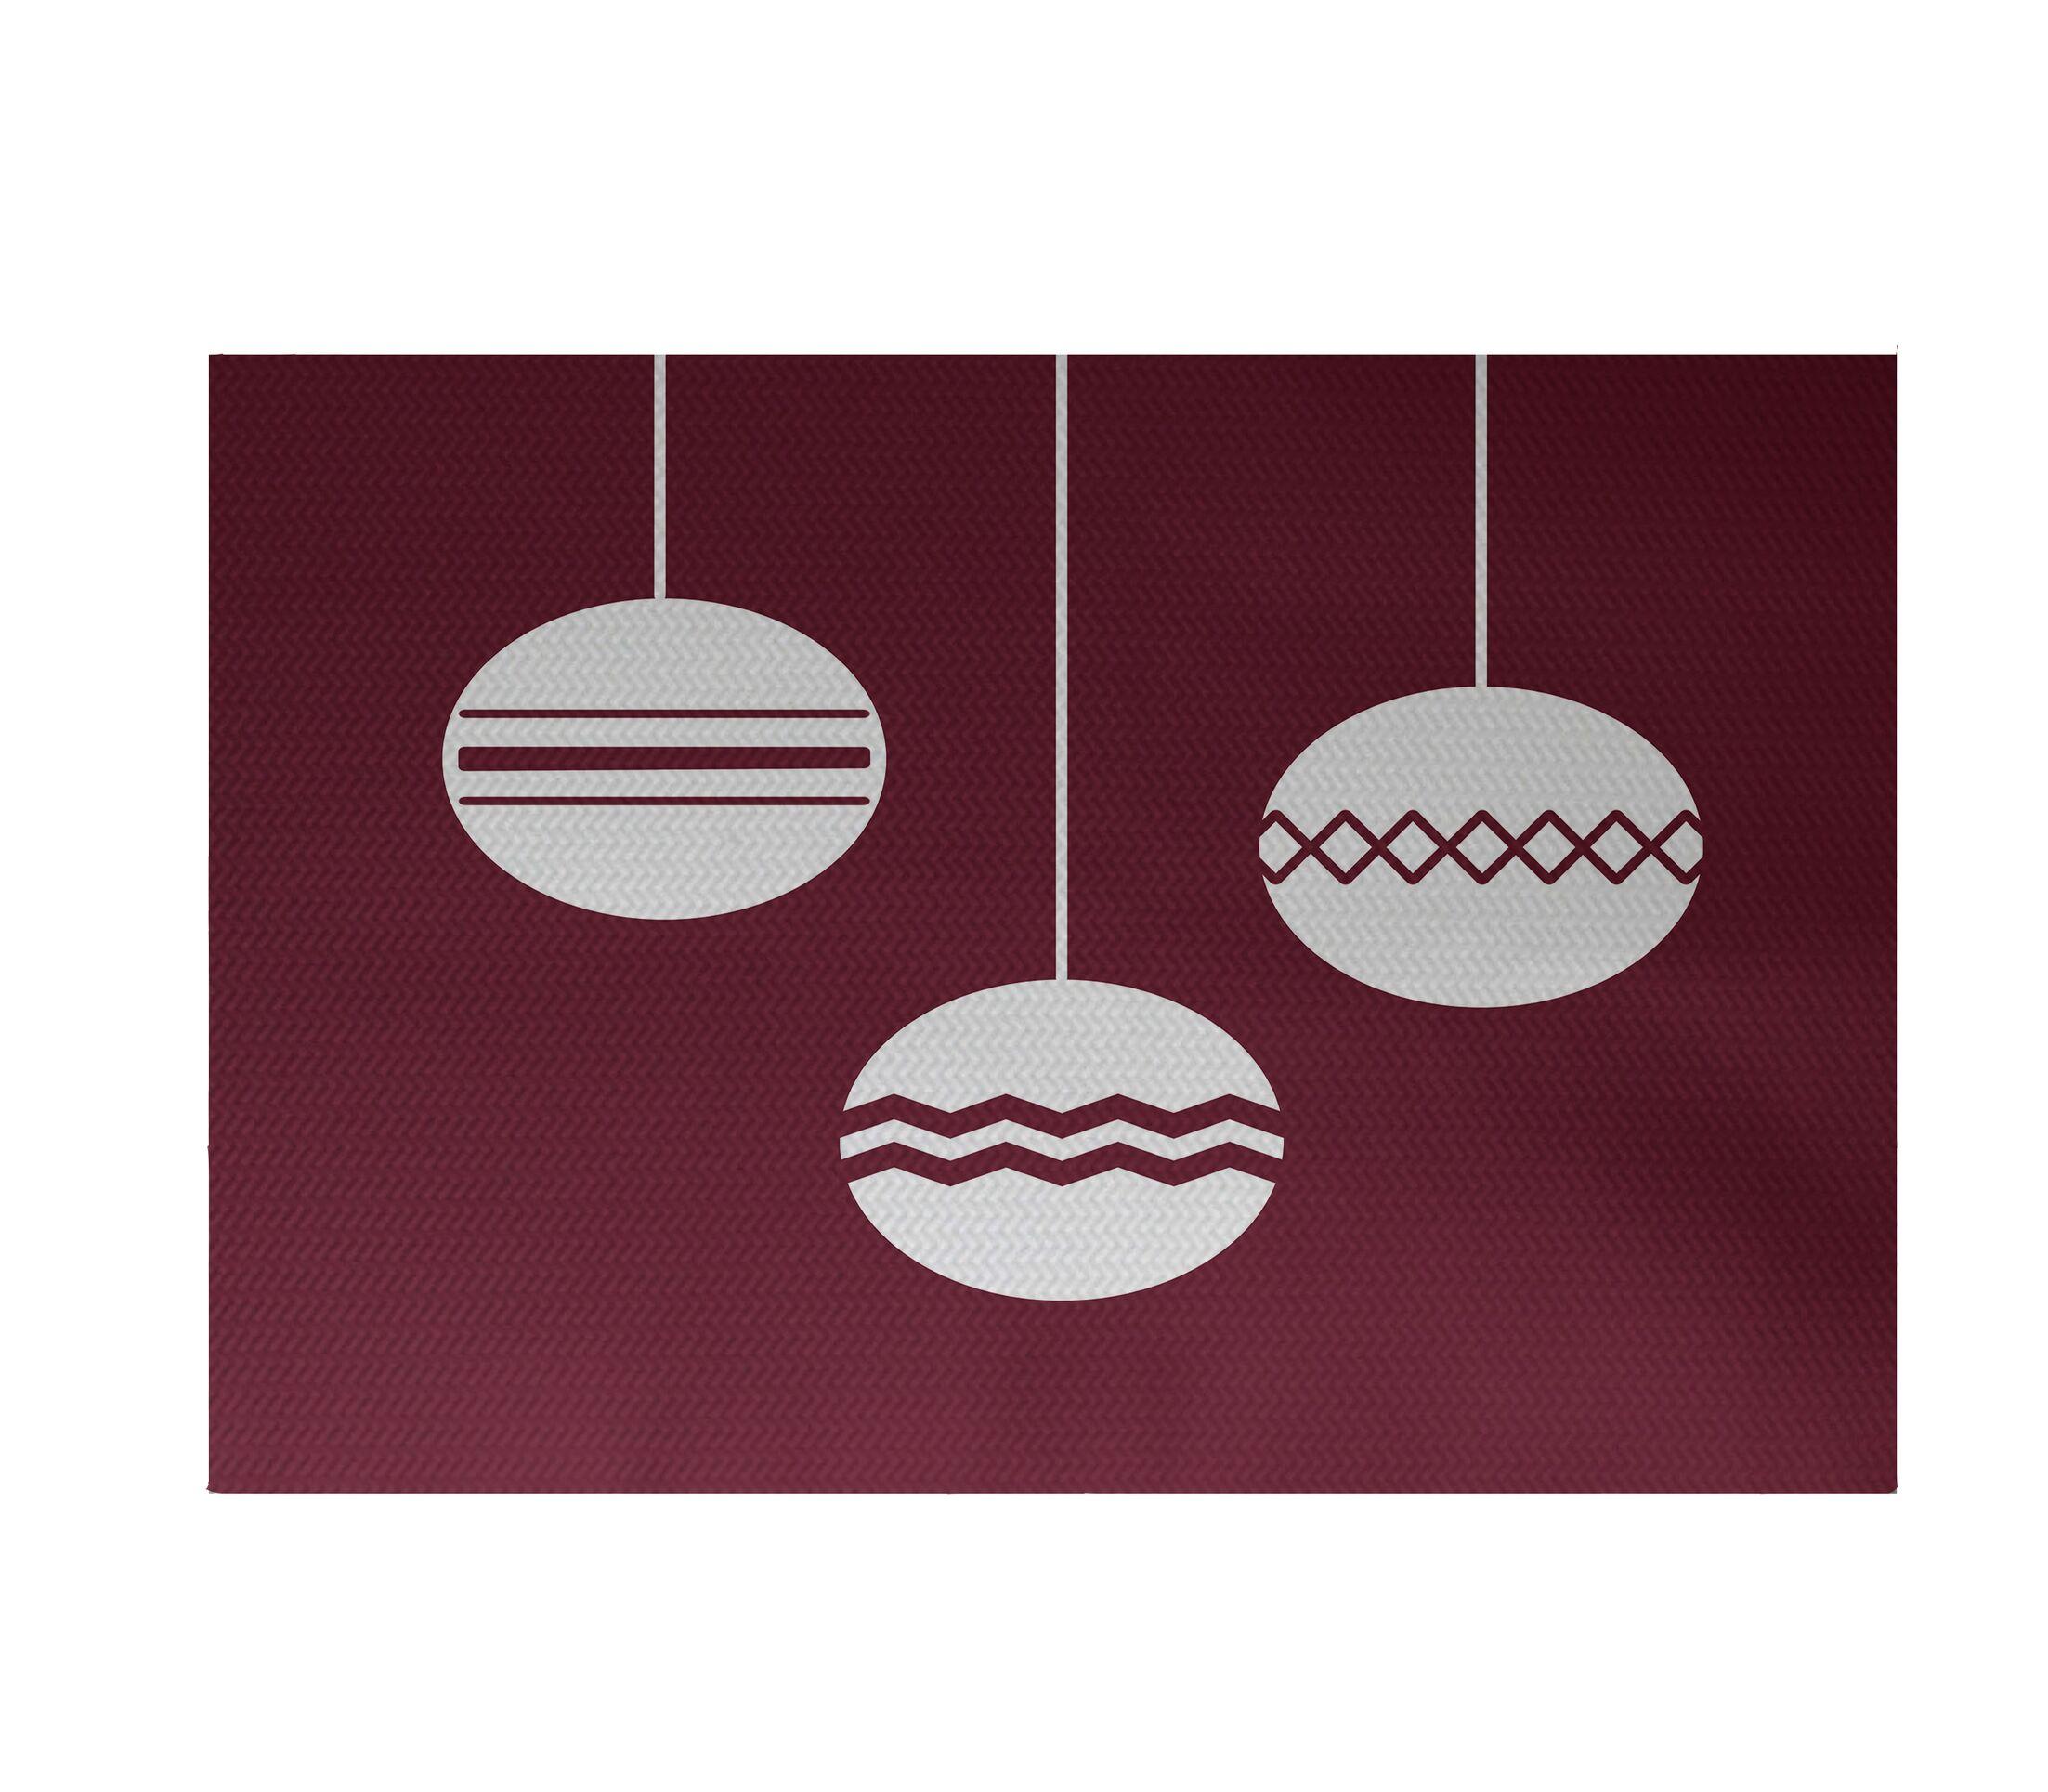 Geo-Bulbs Decorative Holiday Print Cranberry Burgundy Indoor/Outdoor Area Rug Rug Size: Rectangle 3' x 5'